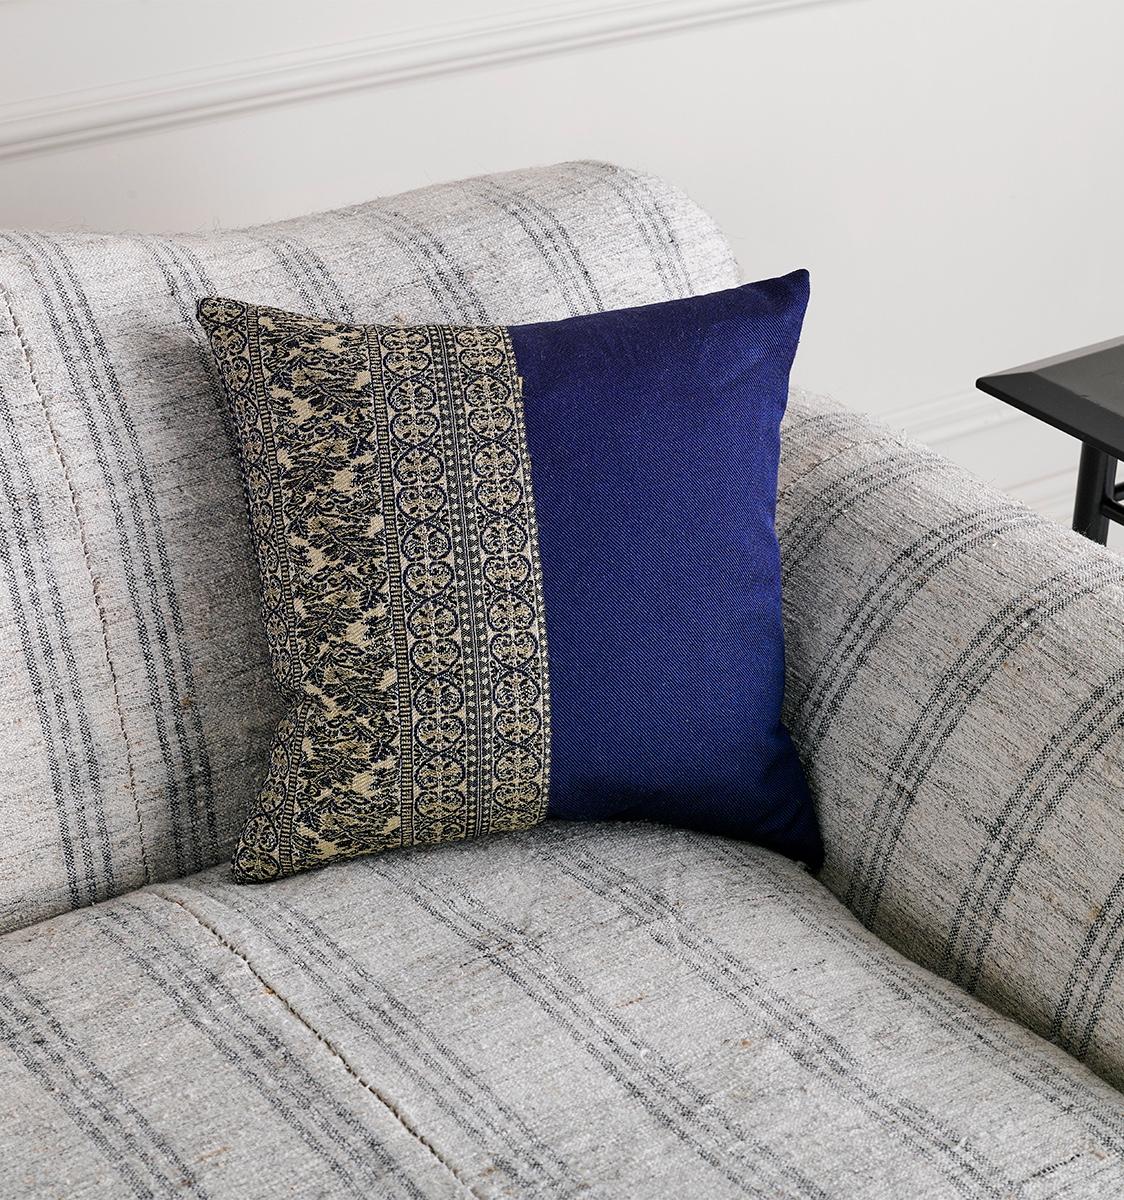 Small Woven Blue Antique Fabric Cushion